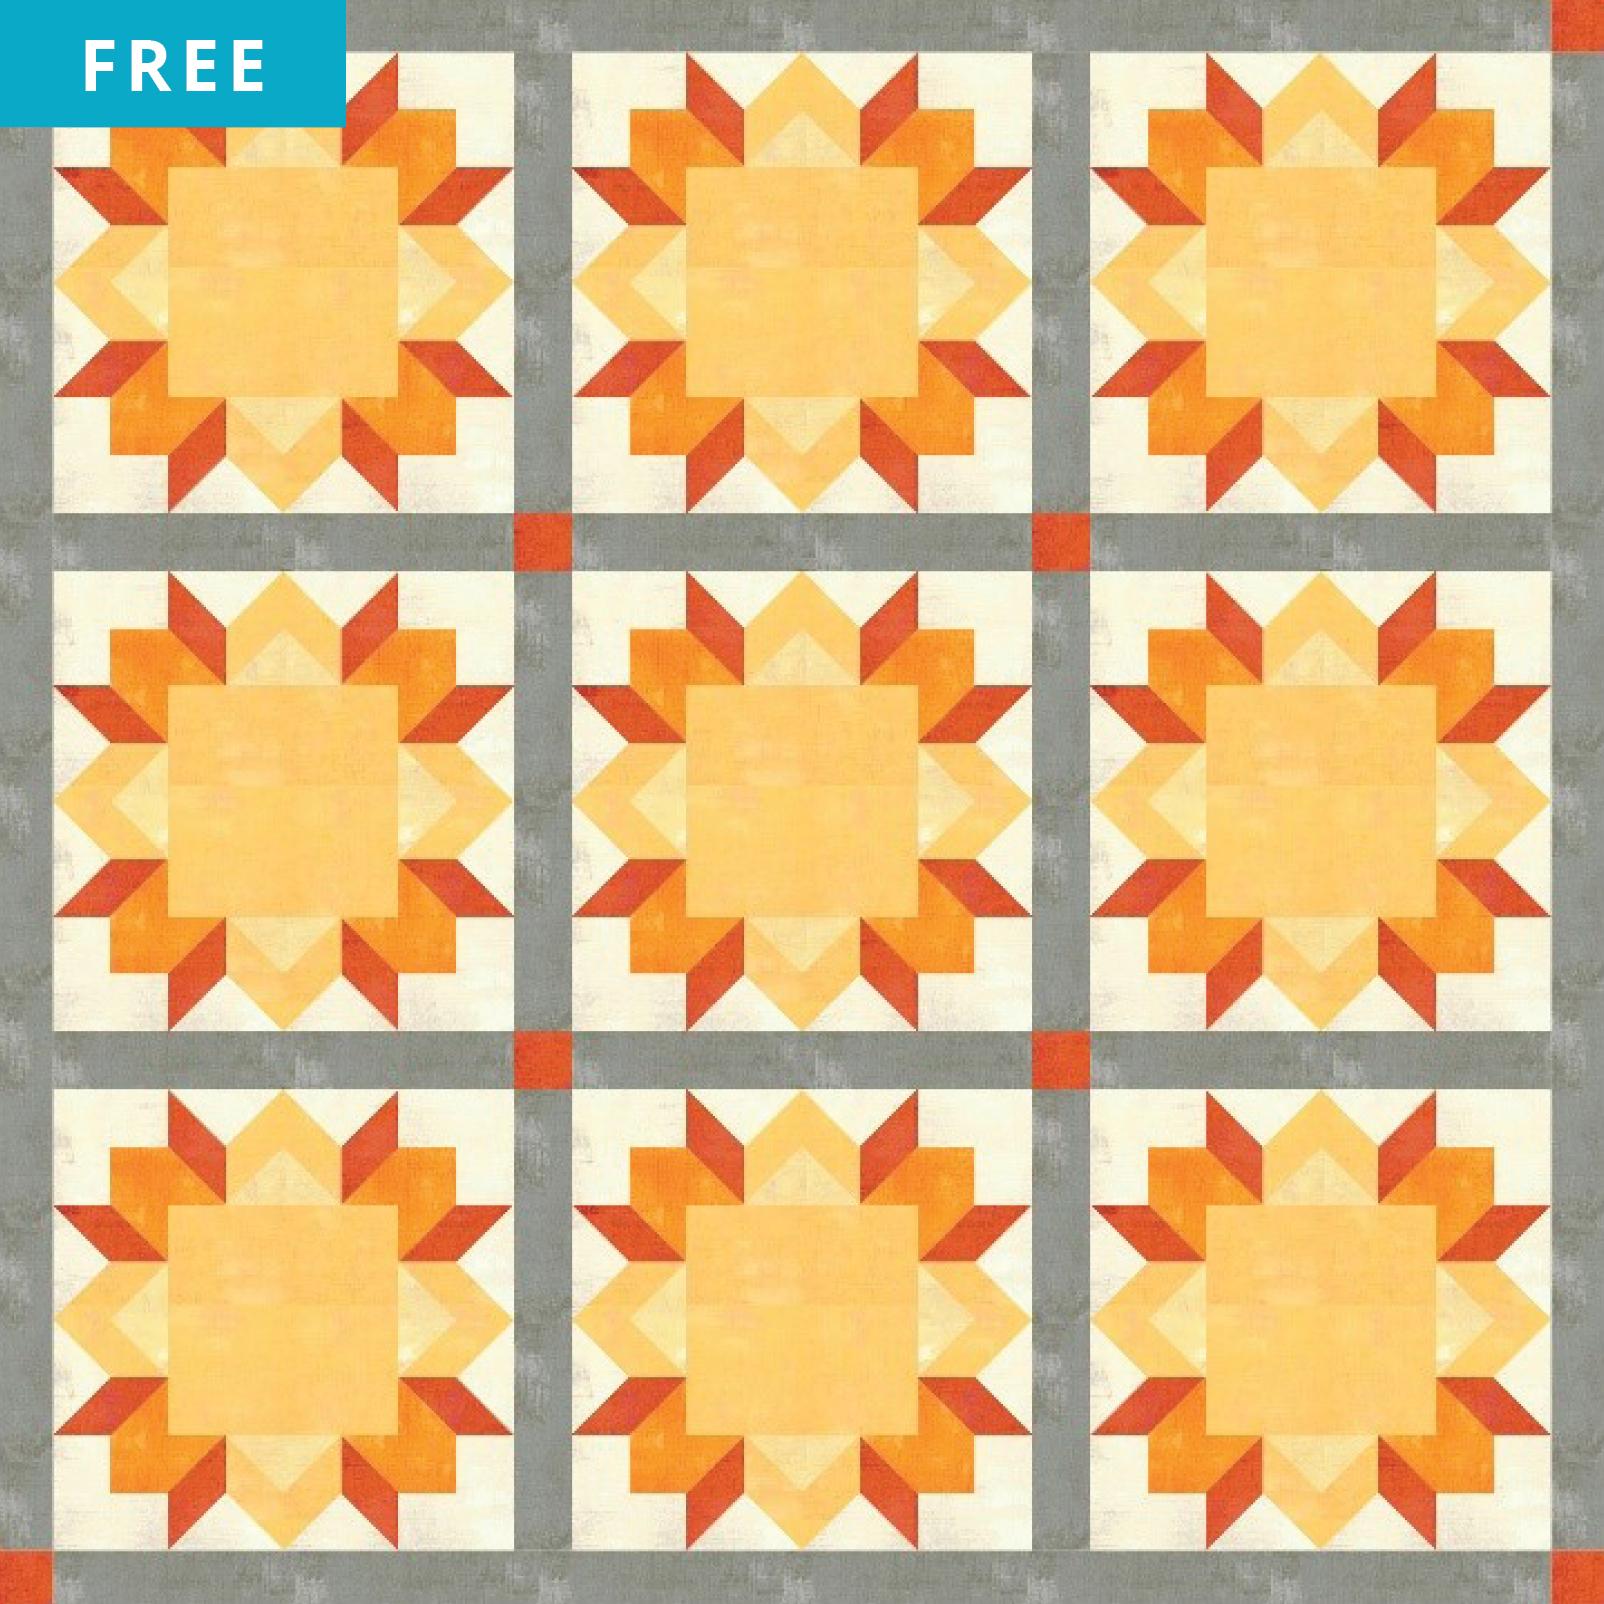 Free Quilt Pattern - Summer Sun